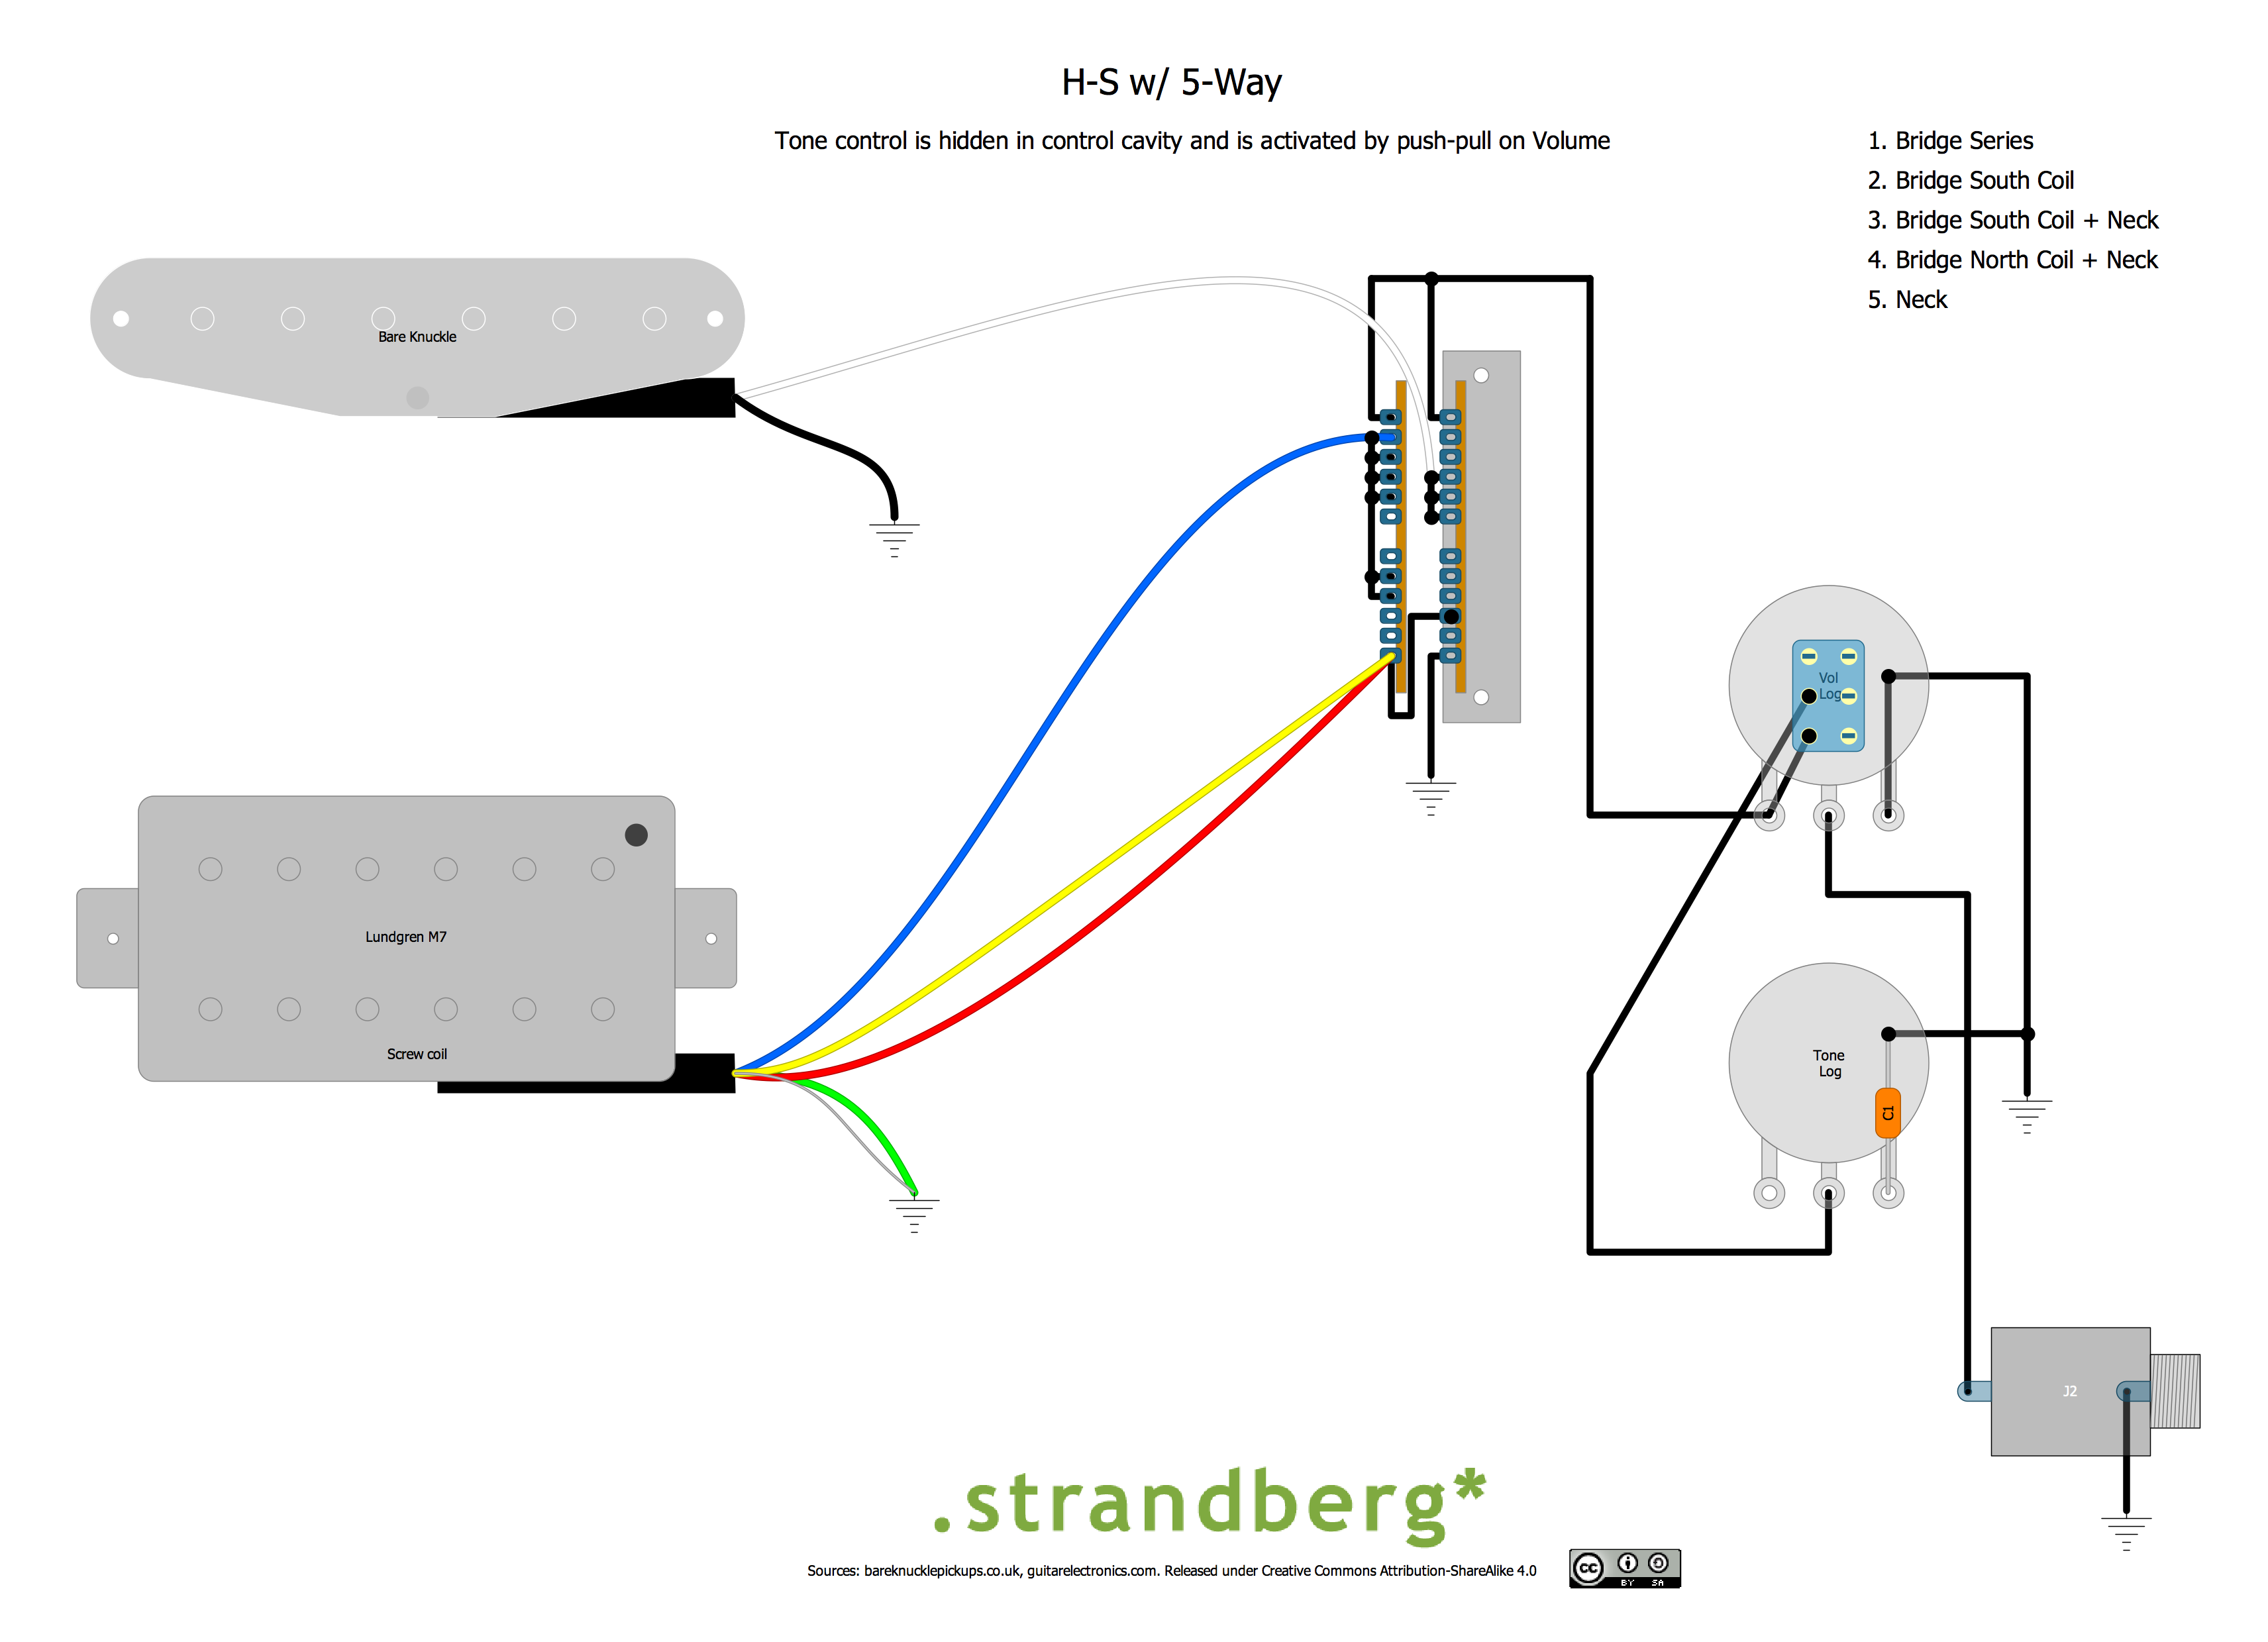 Atemberaubend 2 Humbucker Schaltplan Bilder - Elektrische Schaltplan ...